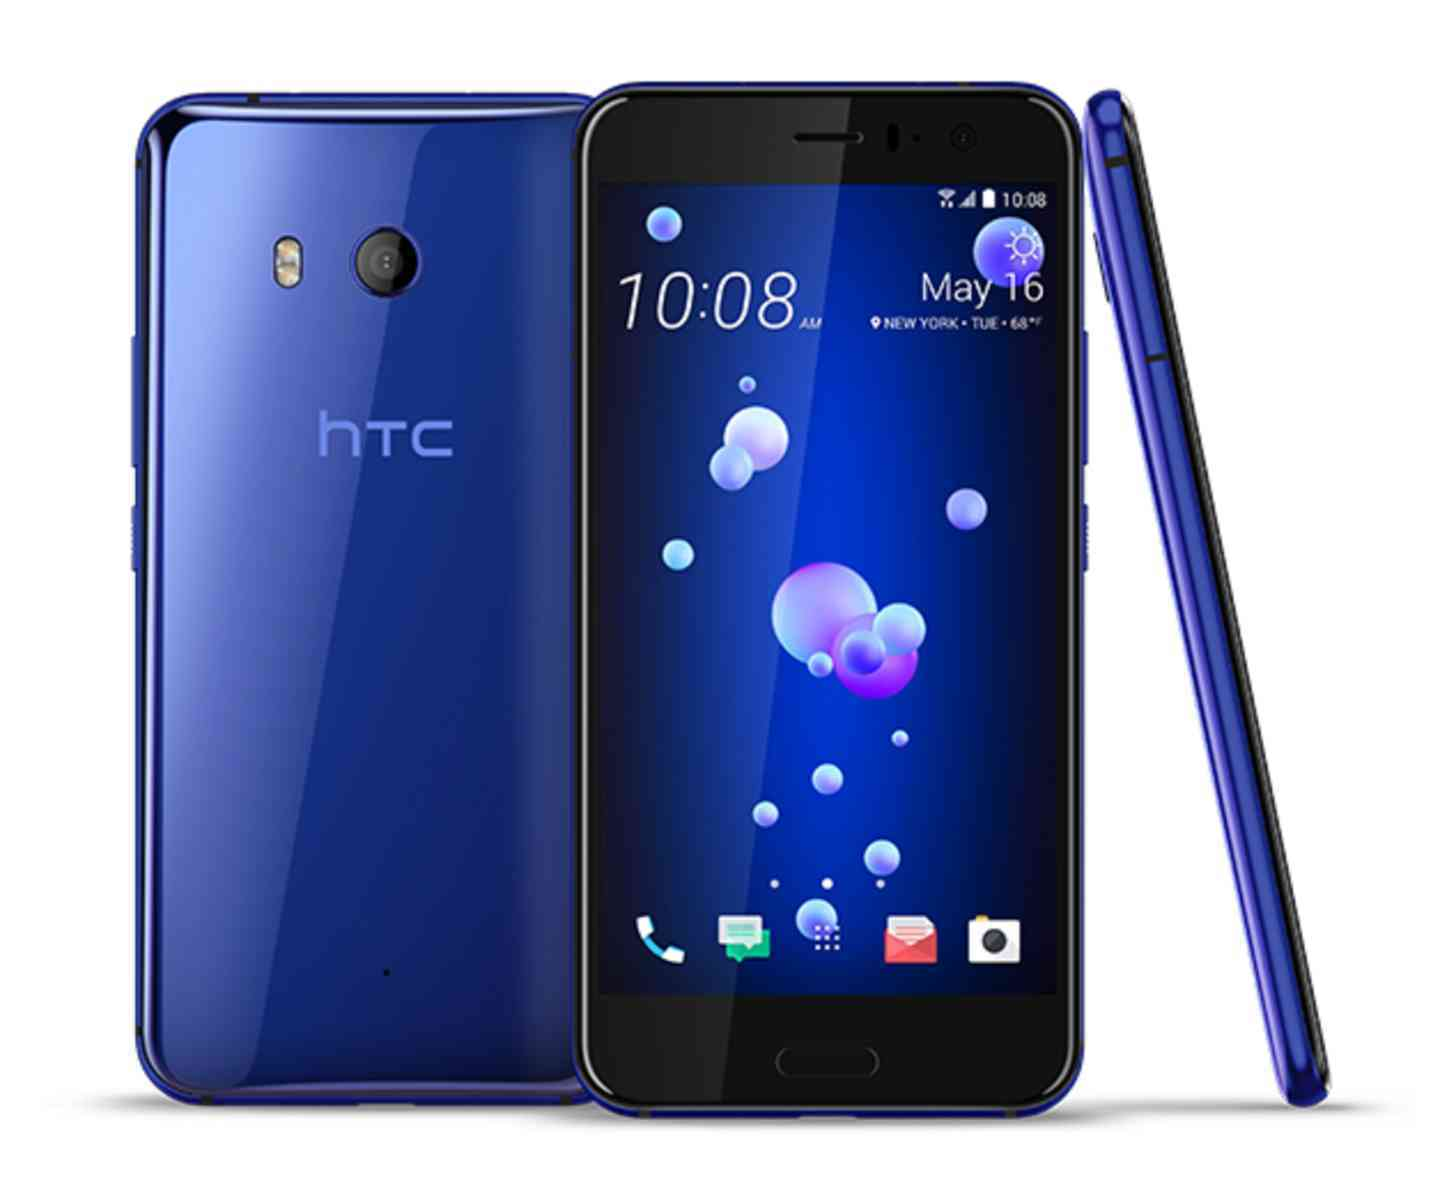 HTC Ocean Life rumor: